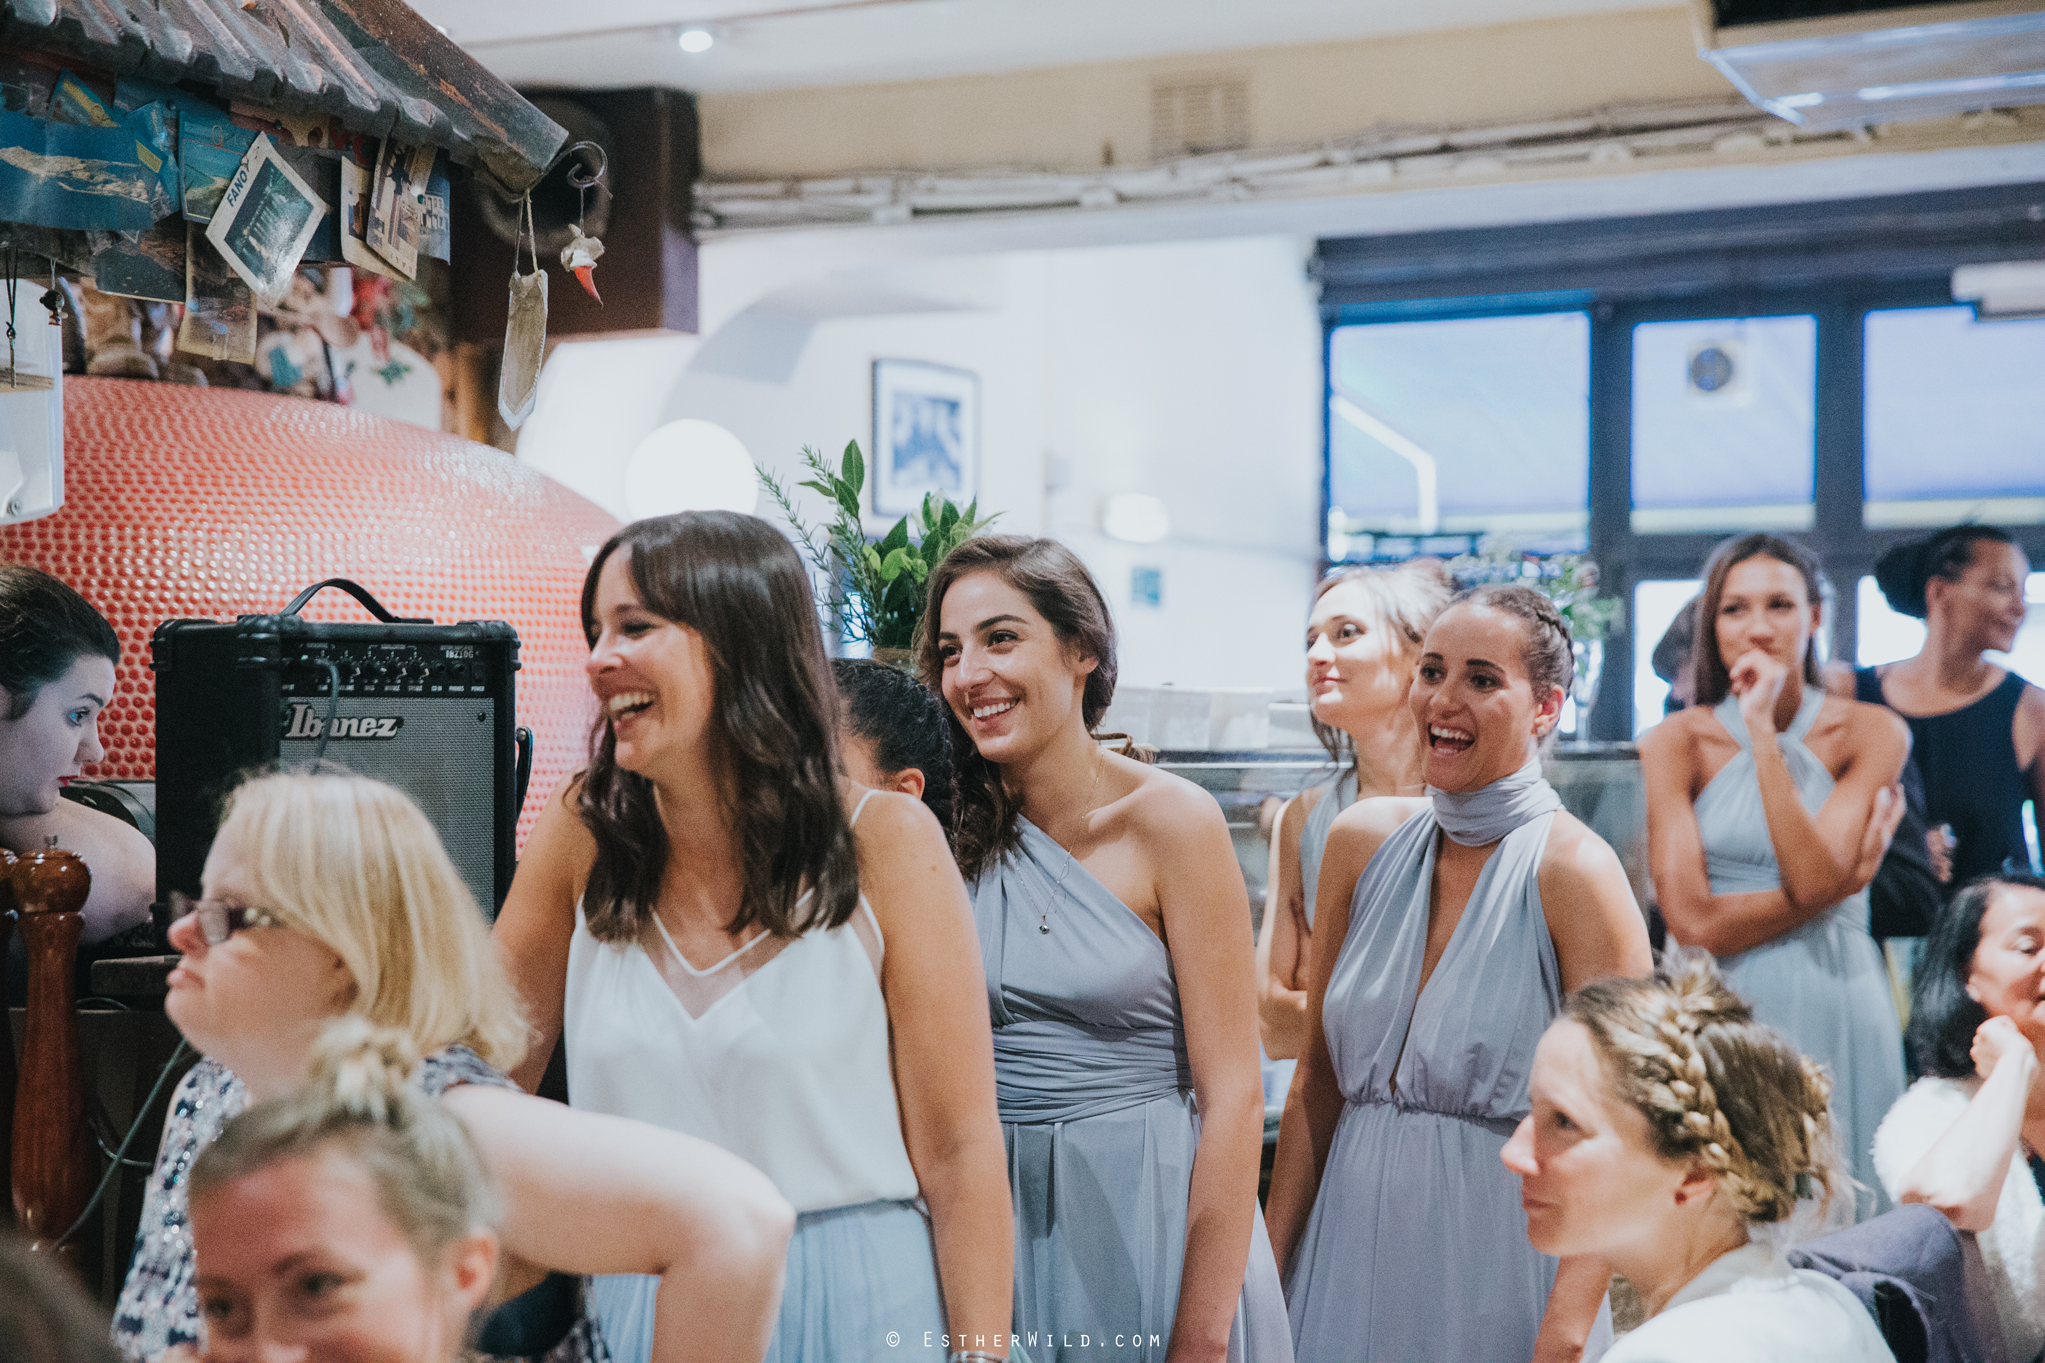 Islington_Town_Hall_Wedding_London_Photographer_Esther_Wild_IMG_6300.jpg